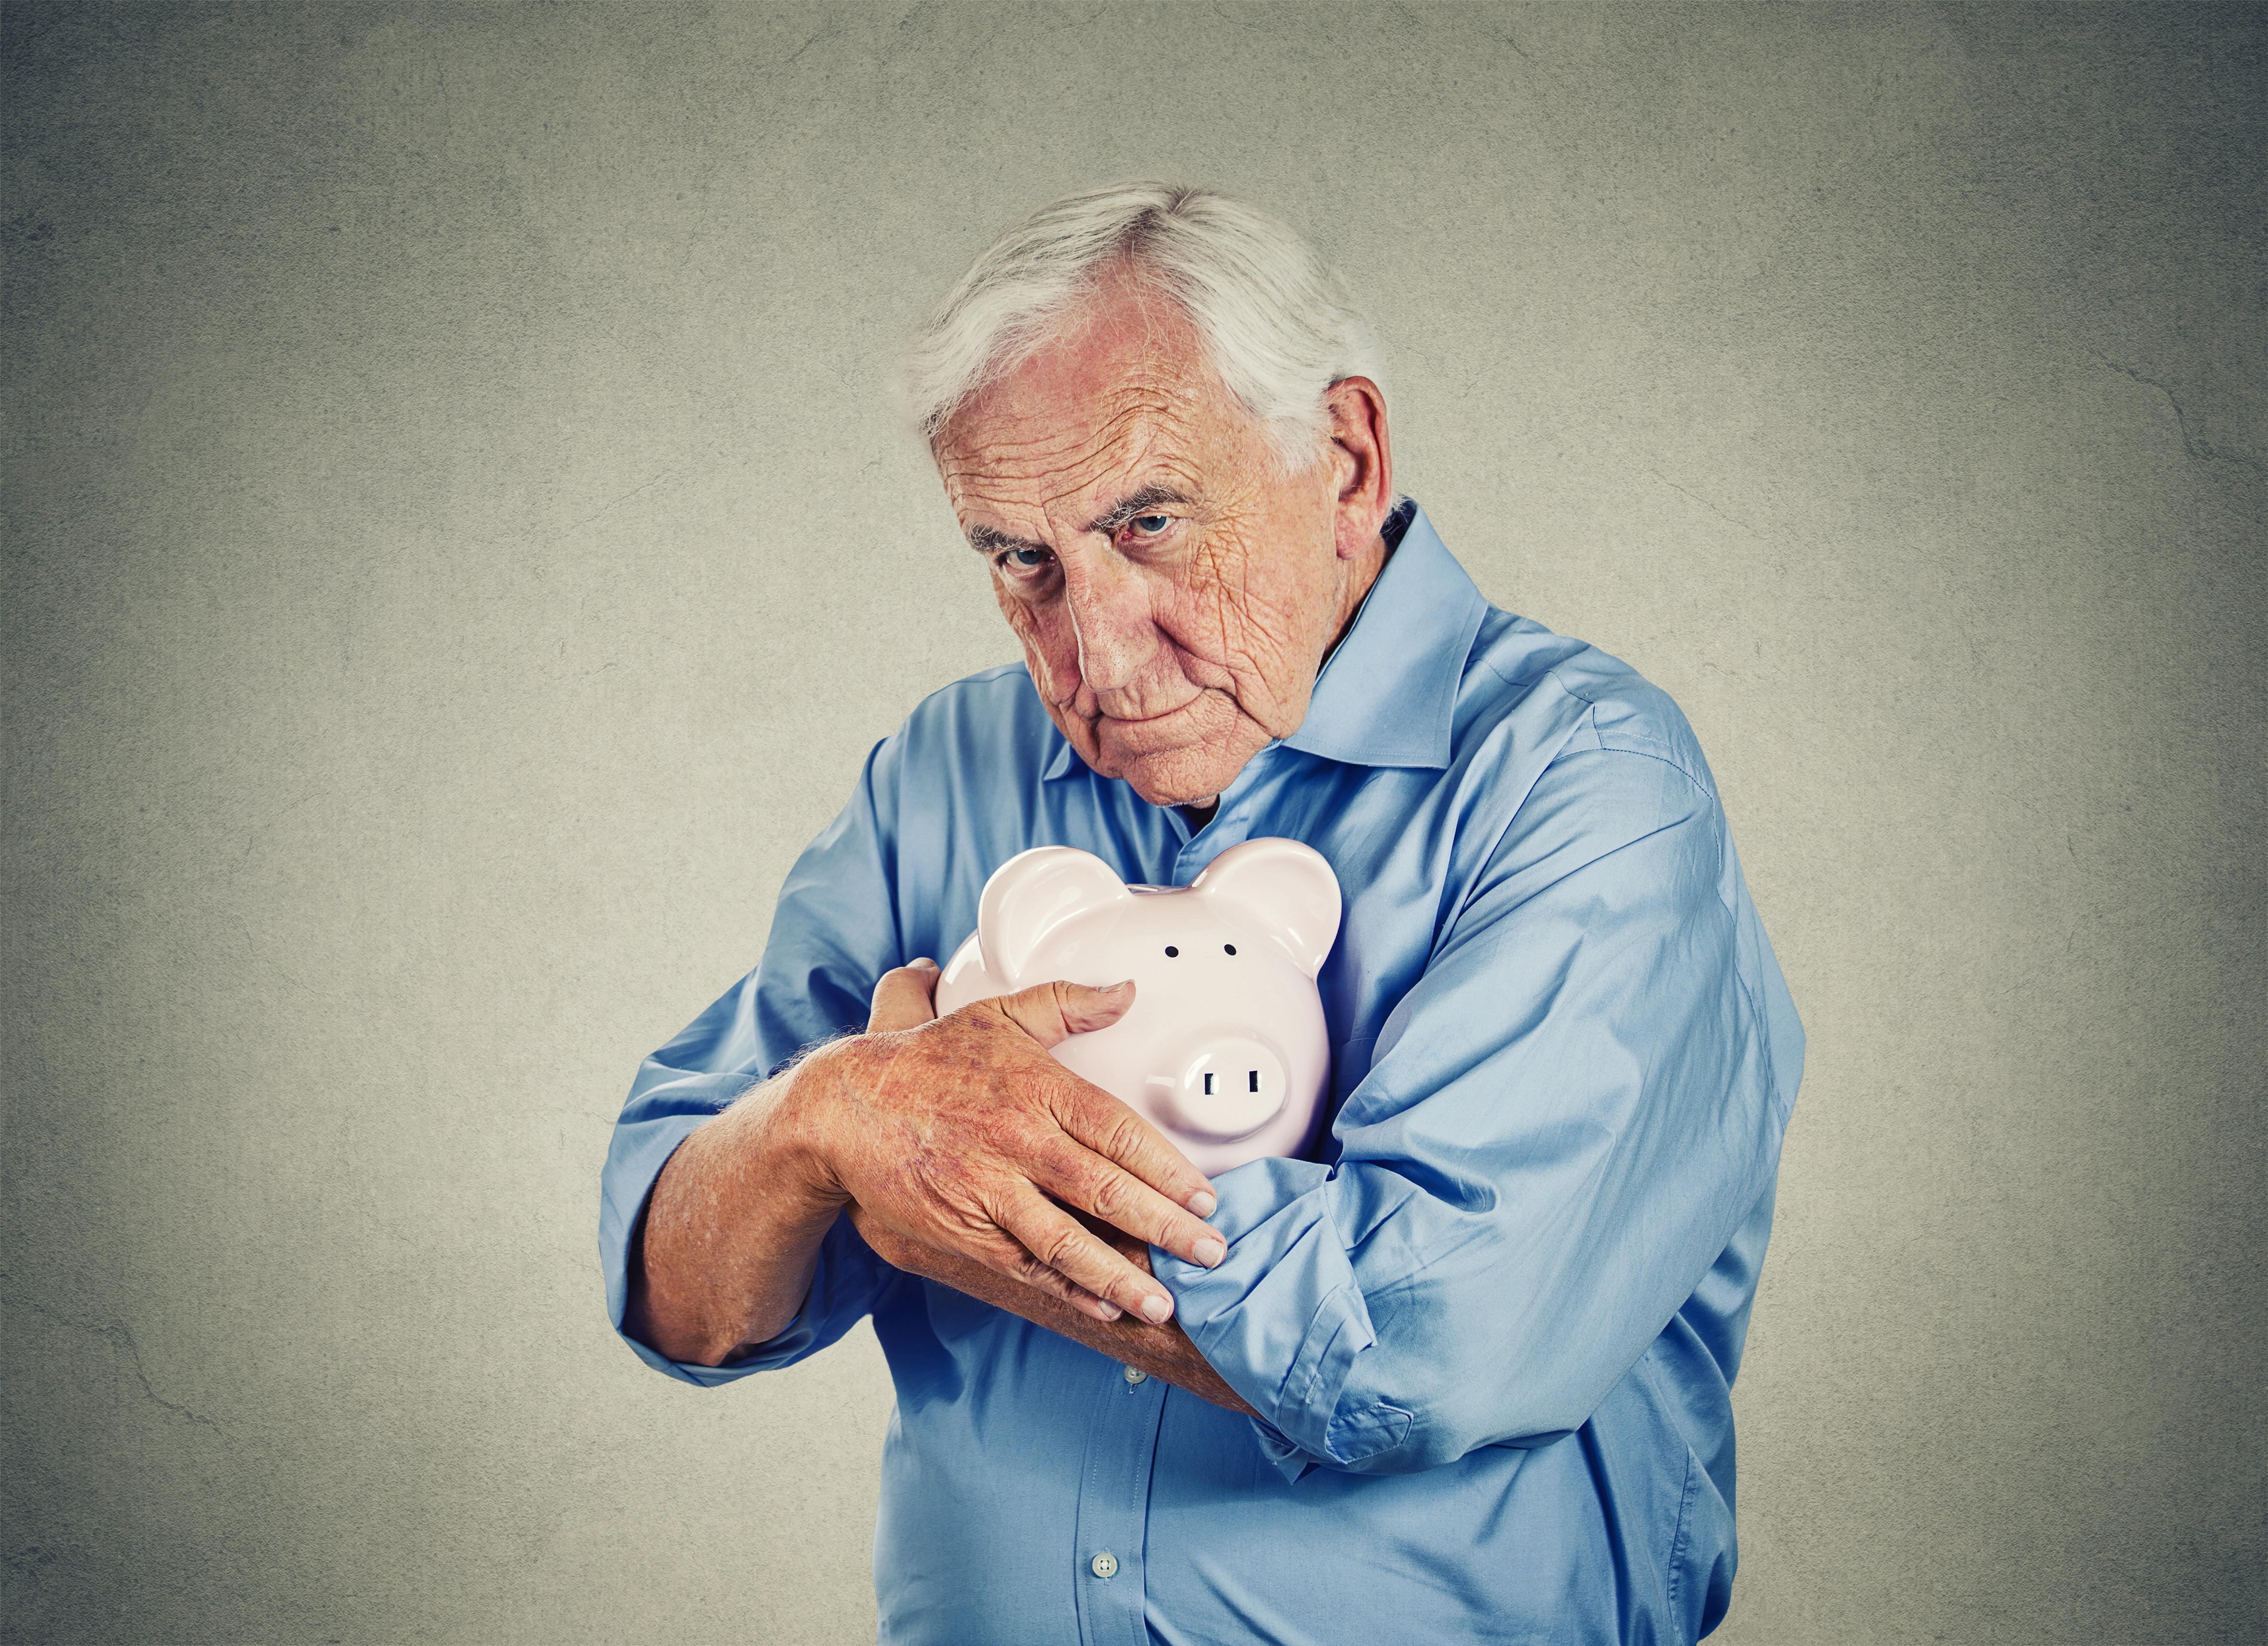 Senior man clutching piggy bank.